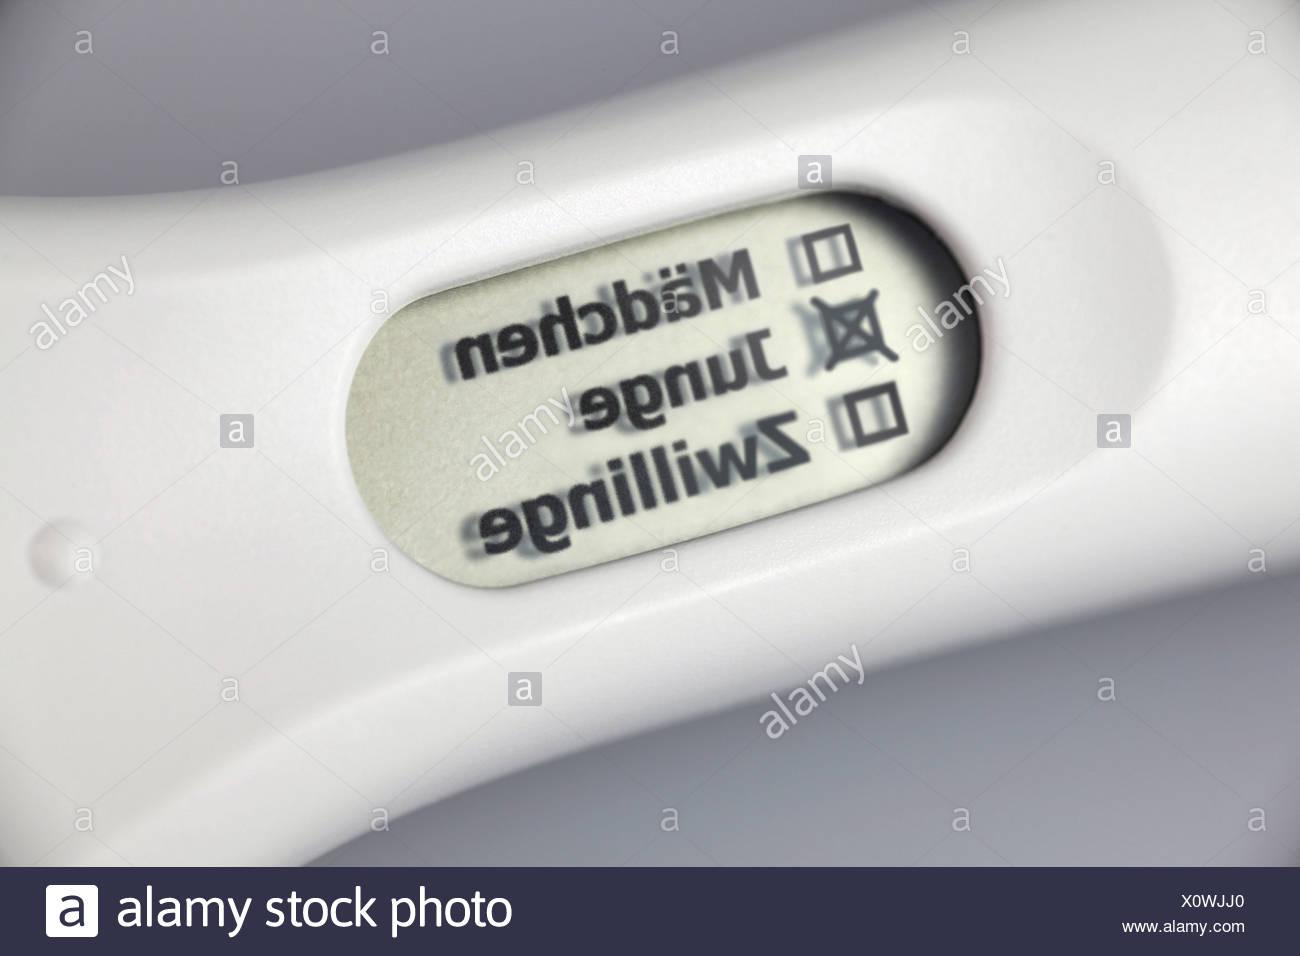 Positiver digitaler Schwangerschaftstest, Junge, teste de gravidez digital positivo, boy Imagens de Stock